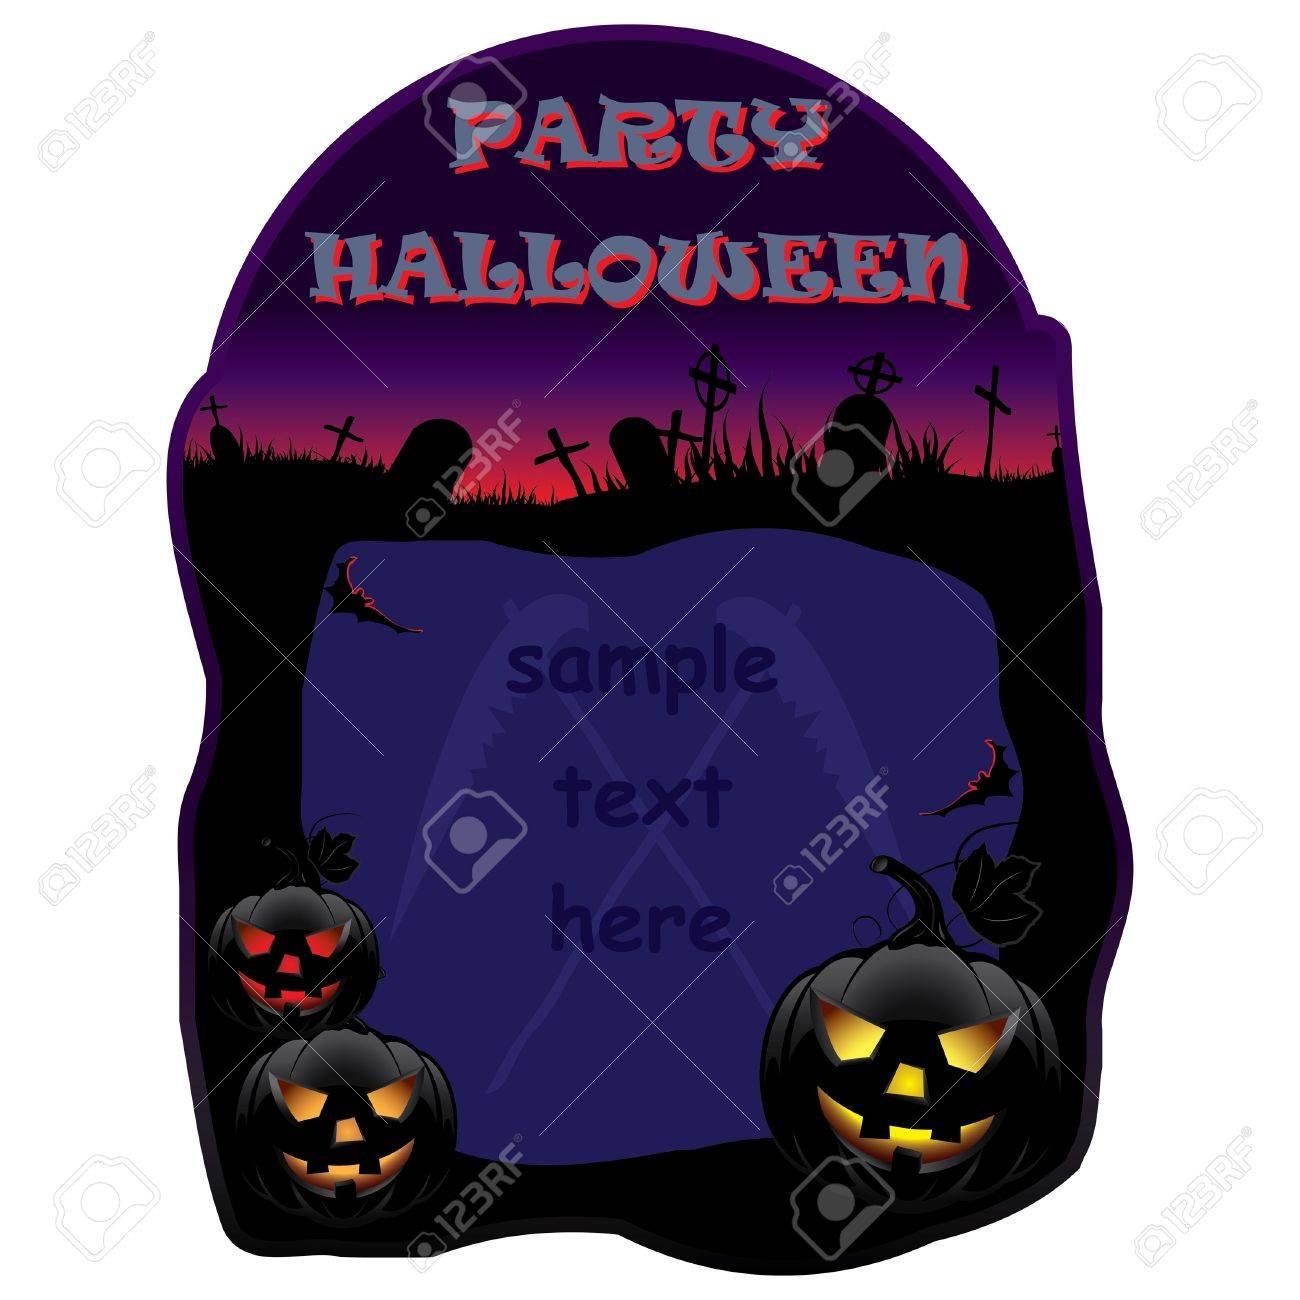 Invitation for Halloween party  Vector illustration Stock Vector - 14708775